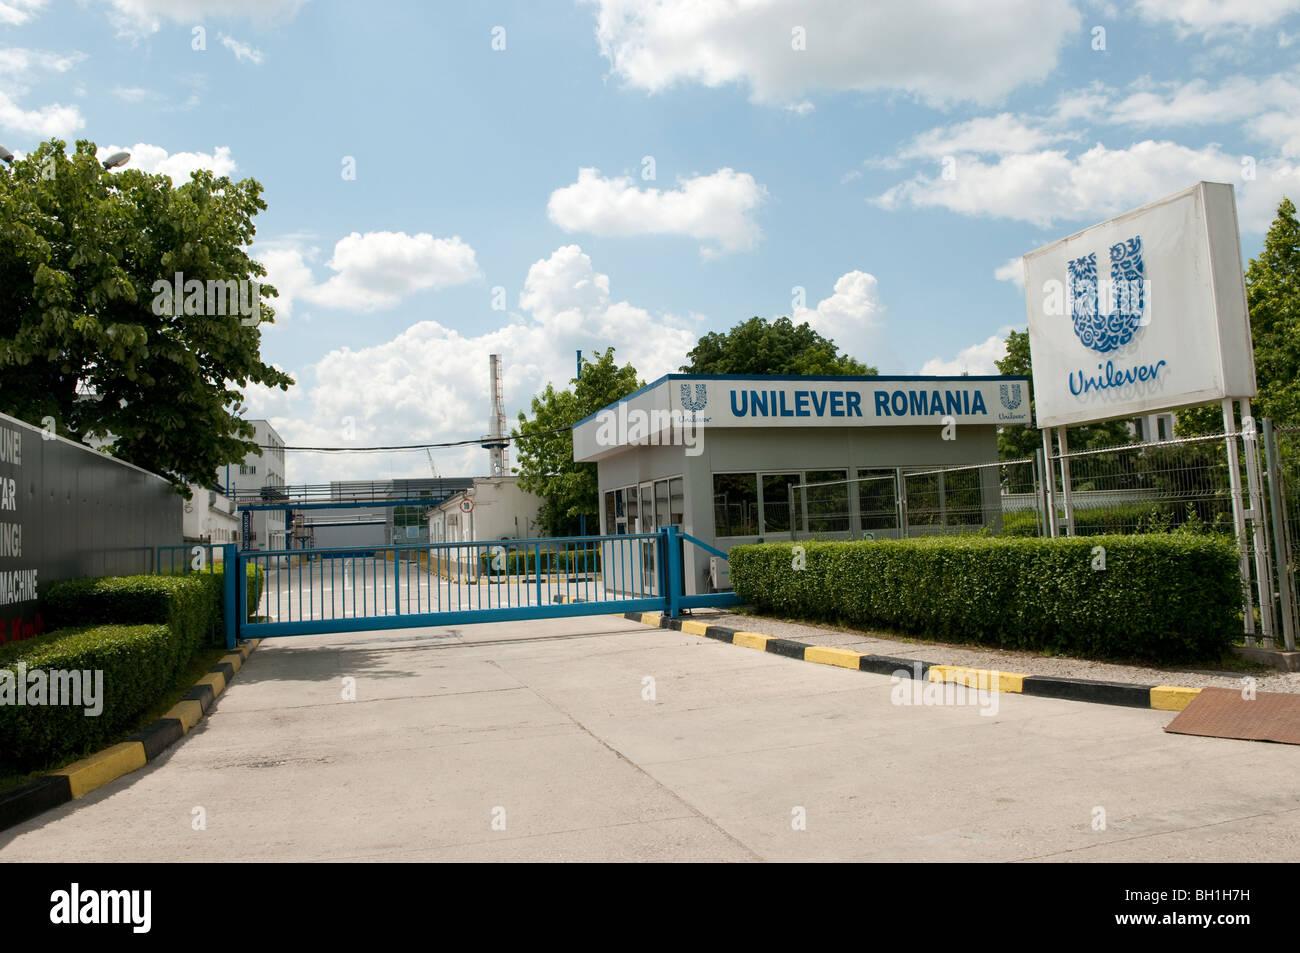 Unilever factory Ploiesti Romania Eastern Europe Stock Photo